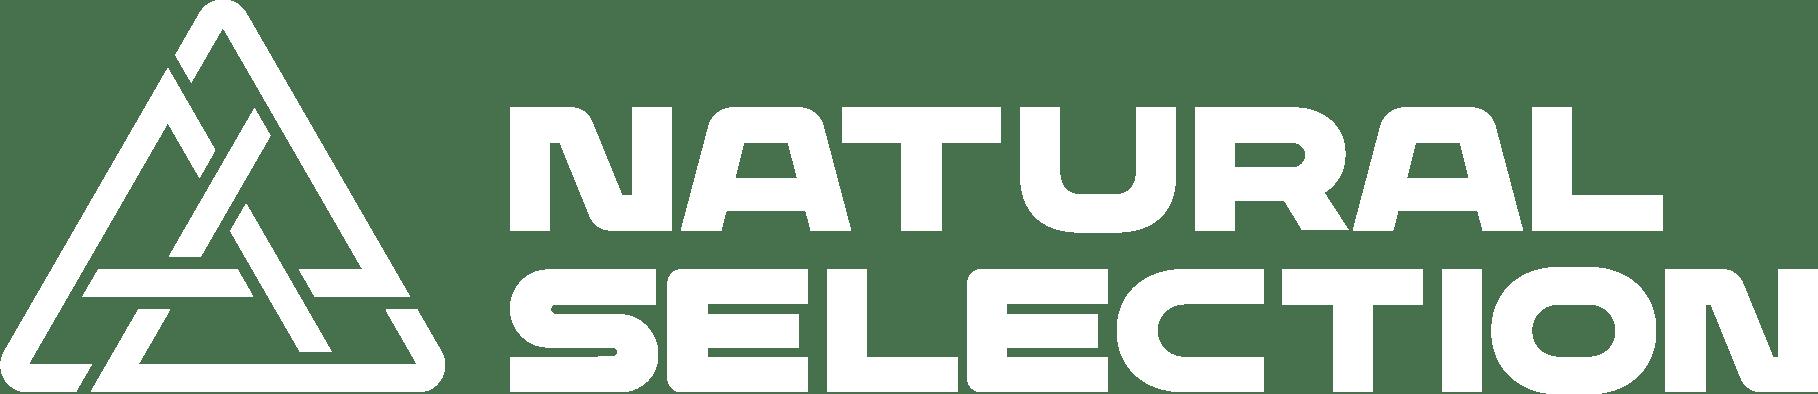 Natural Selection Tour Logo